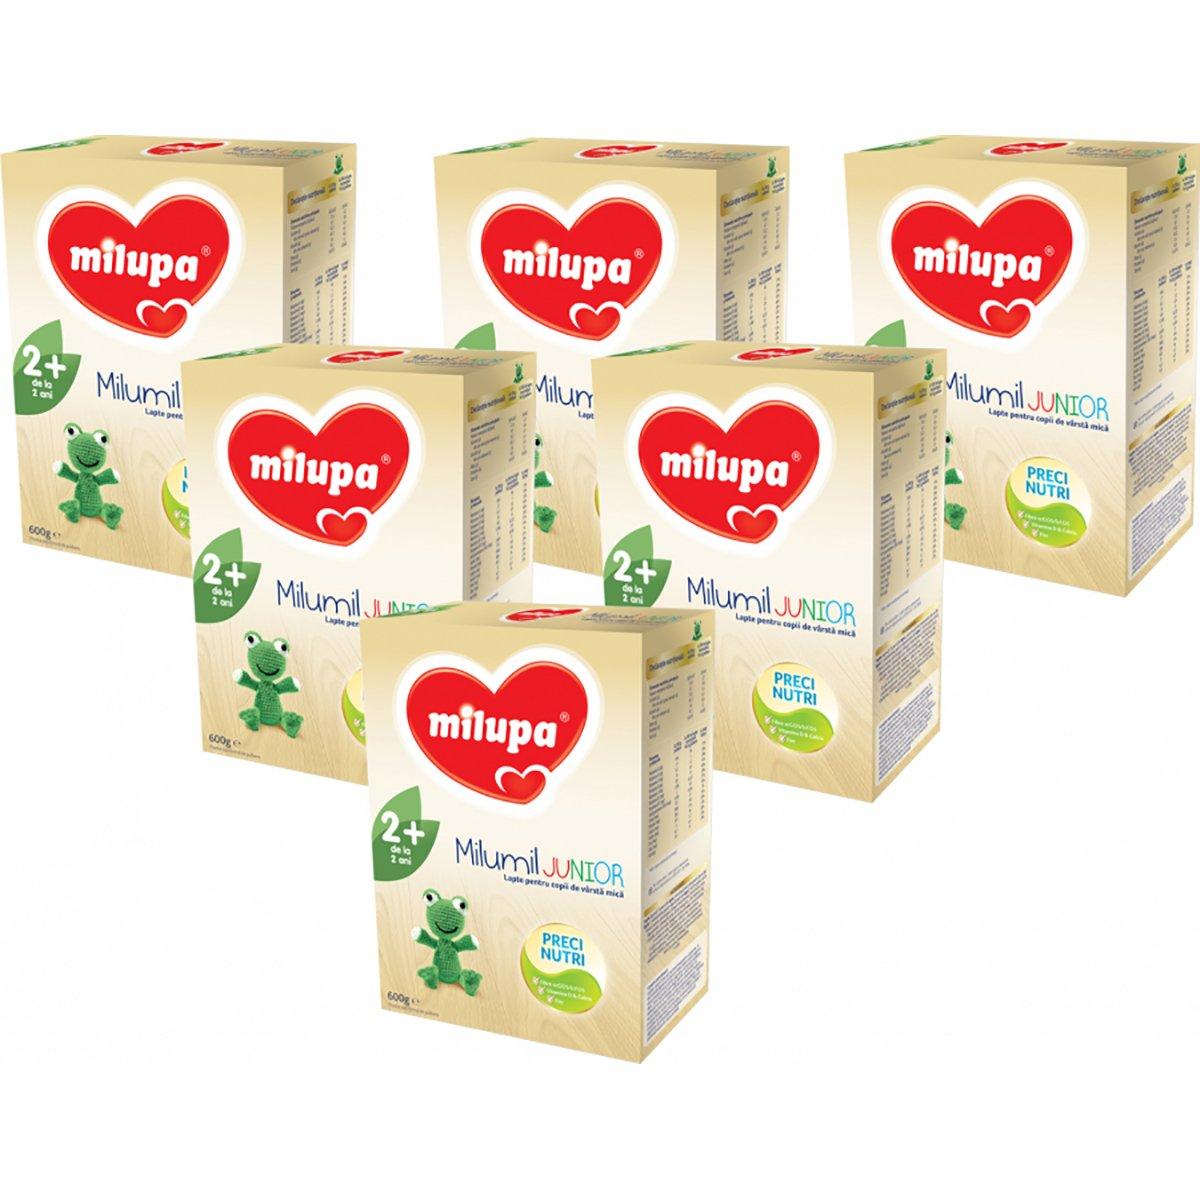 Lapte praf Milupa Milumil Junior 2+, 6 pachete x 600 g imagine